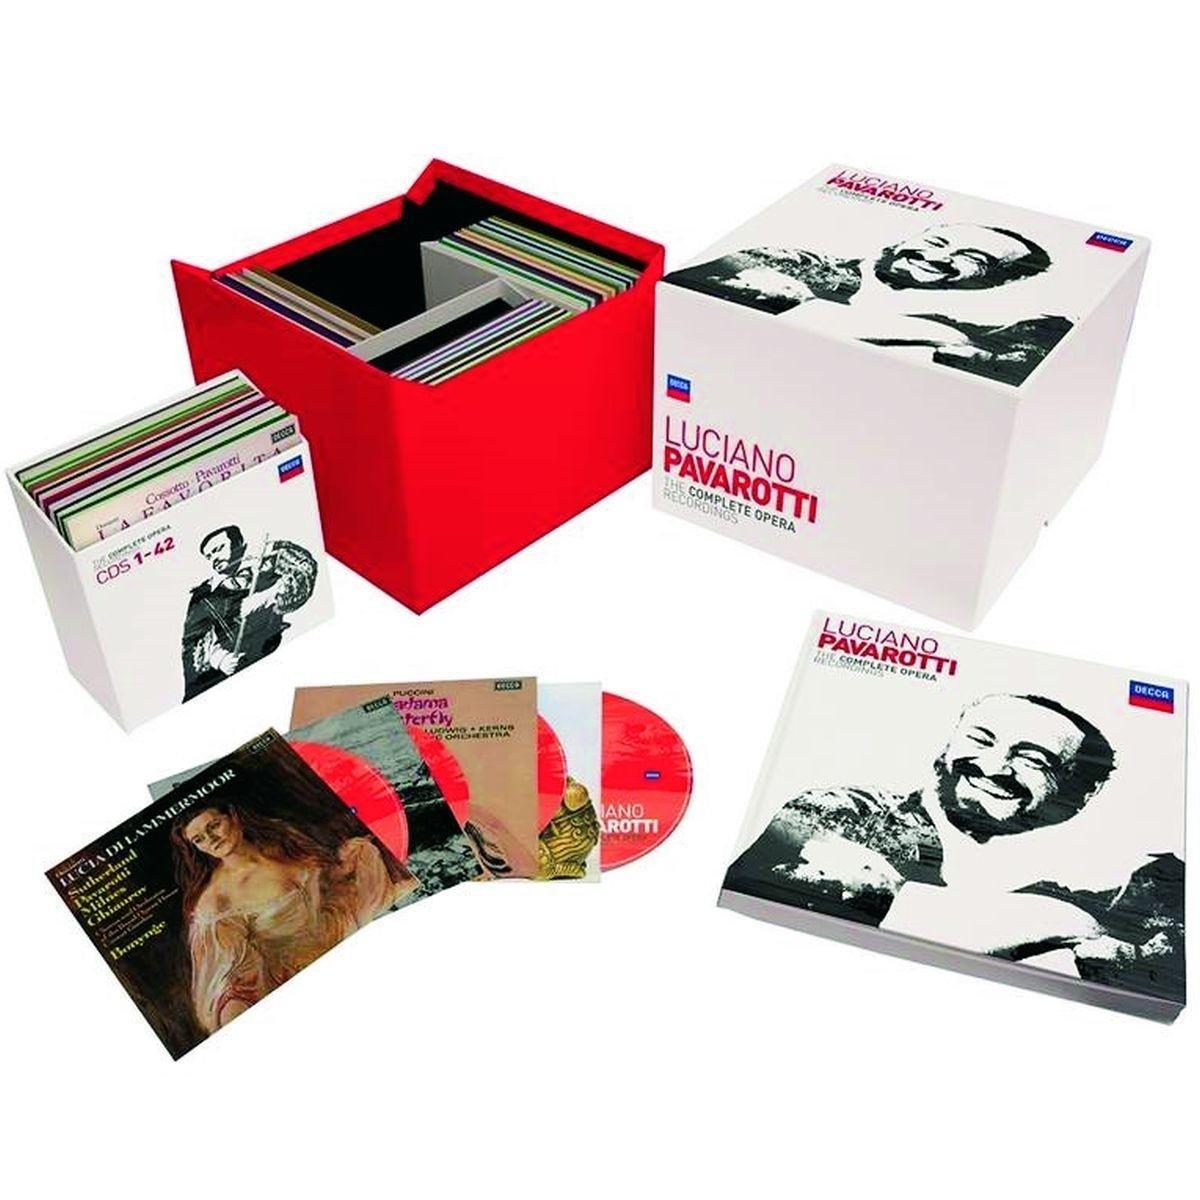 CD : Luciano Pavarotti - Complete Operas (Boxed Set, 101PC)